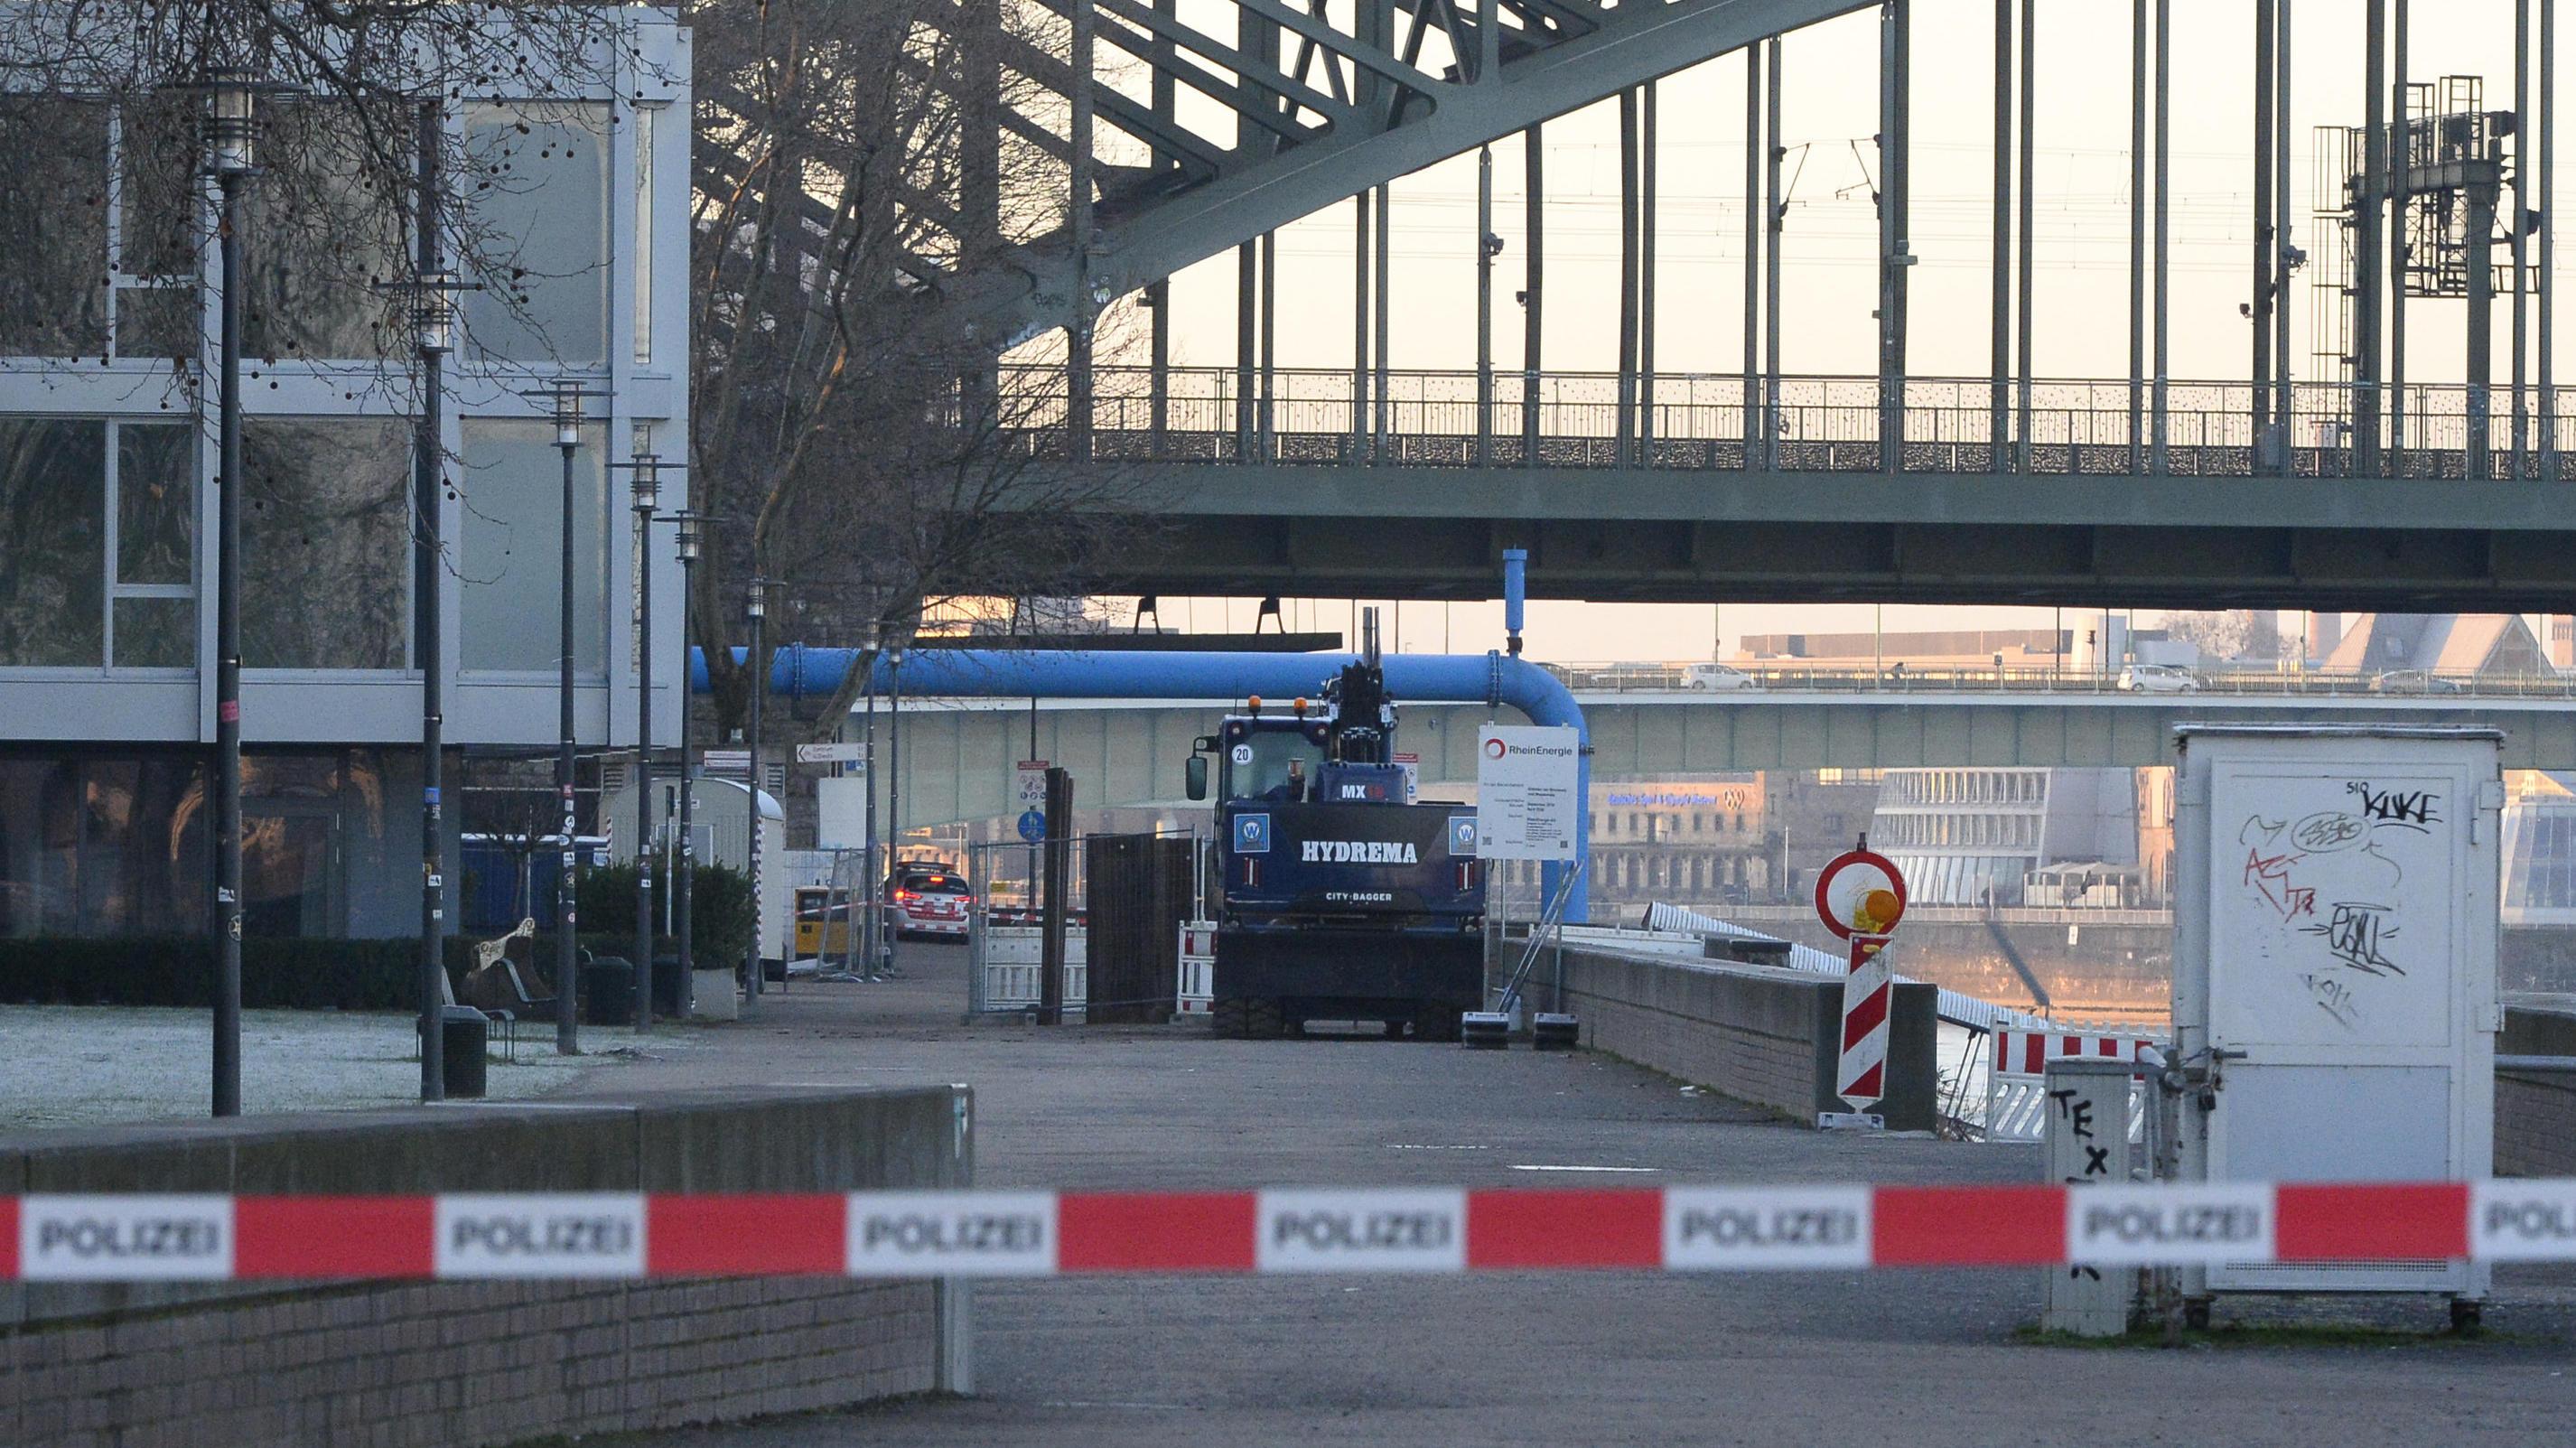 Bombenentschärfung Heute Köln